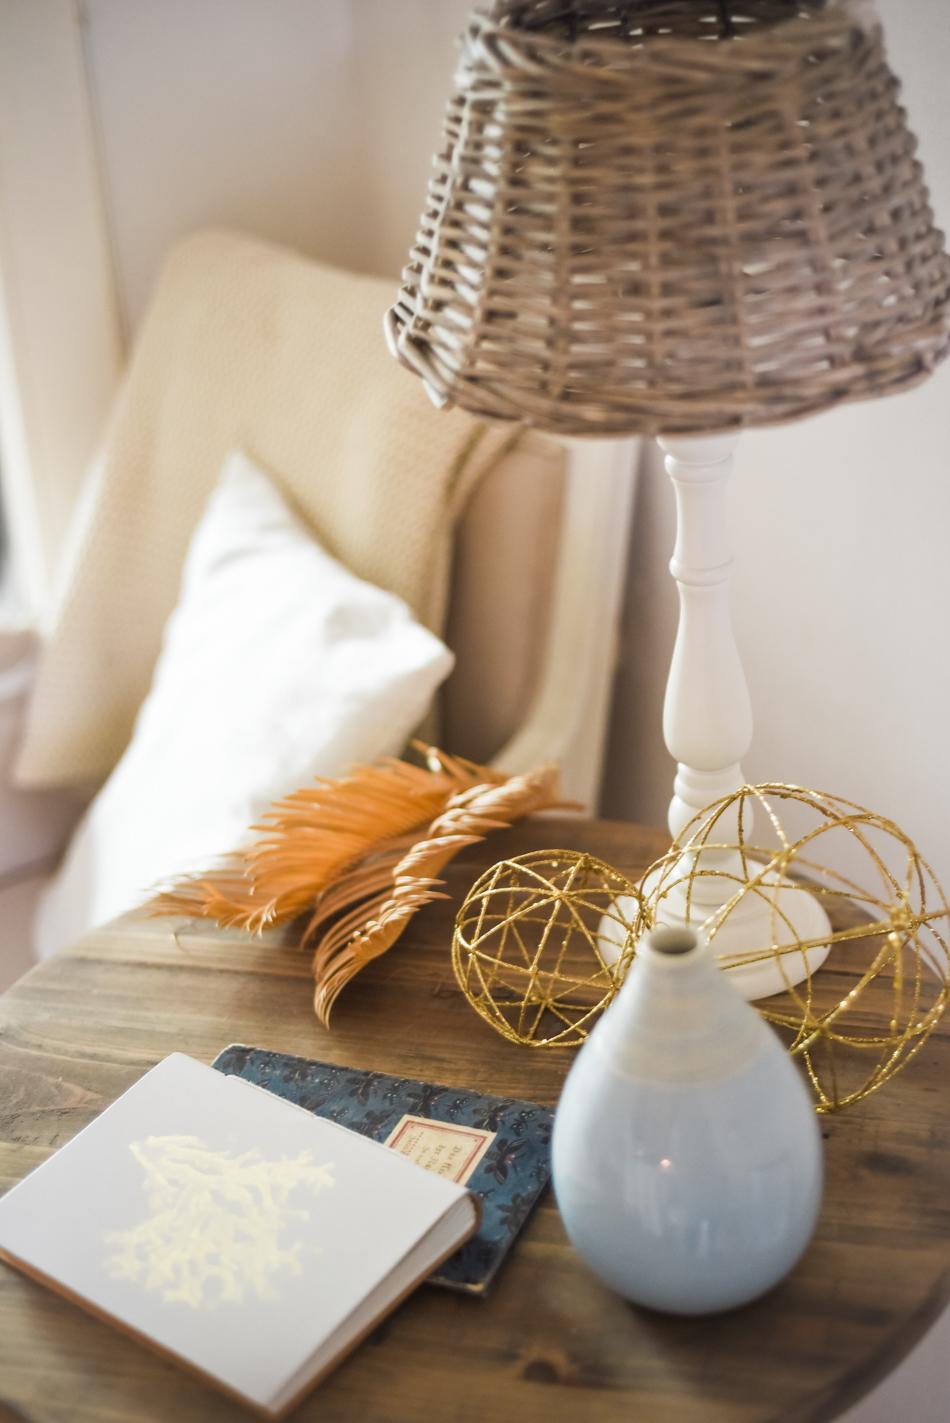 Summer-House-Feeling-With-Blue-and-gold-Decor-AnaisStoelen-9.jpg